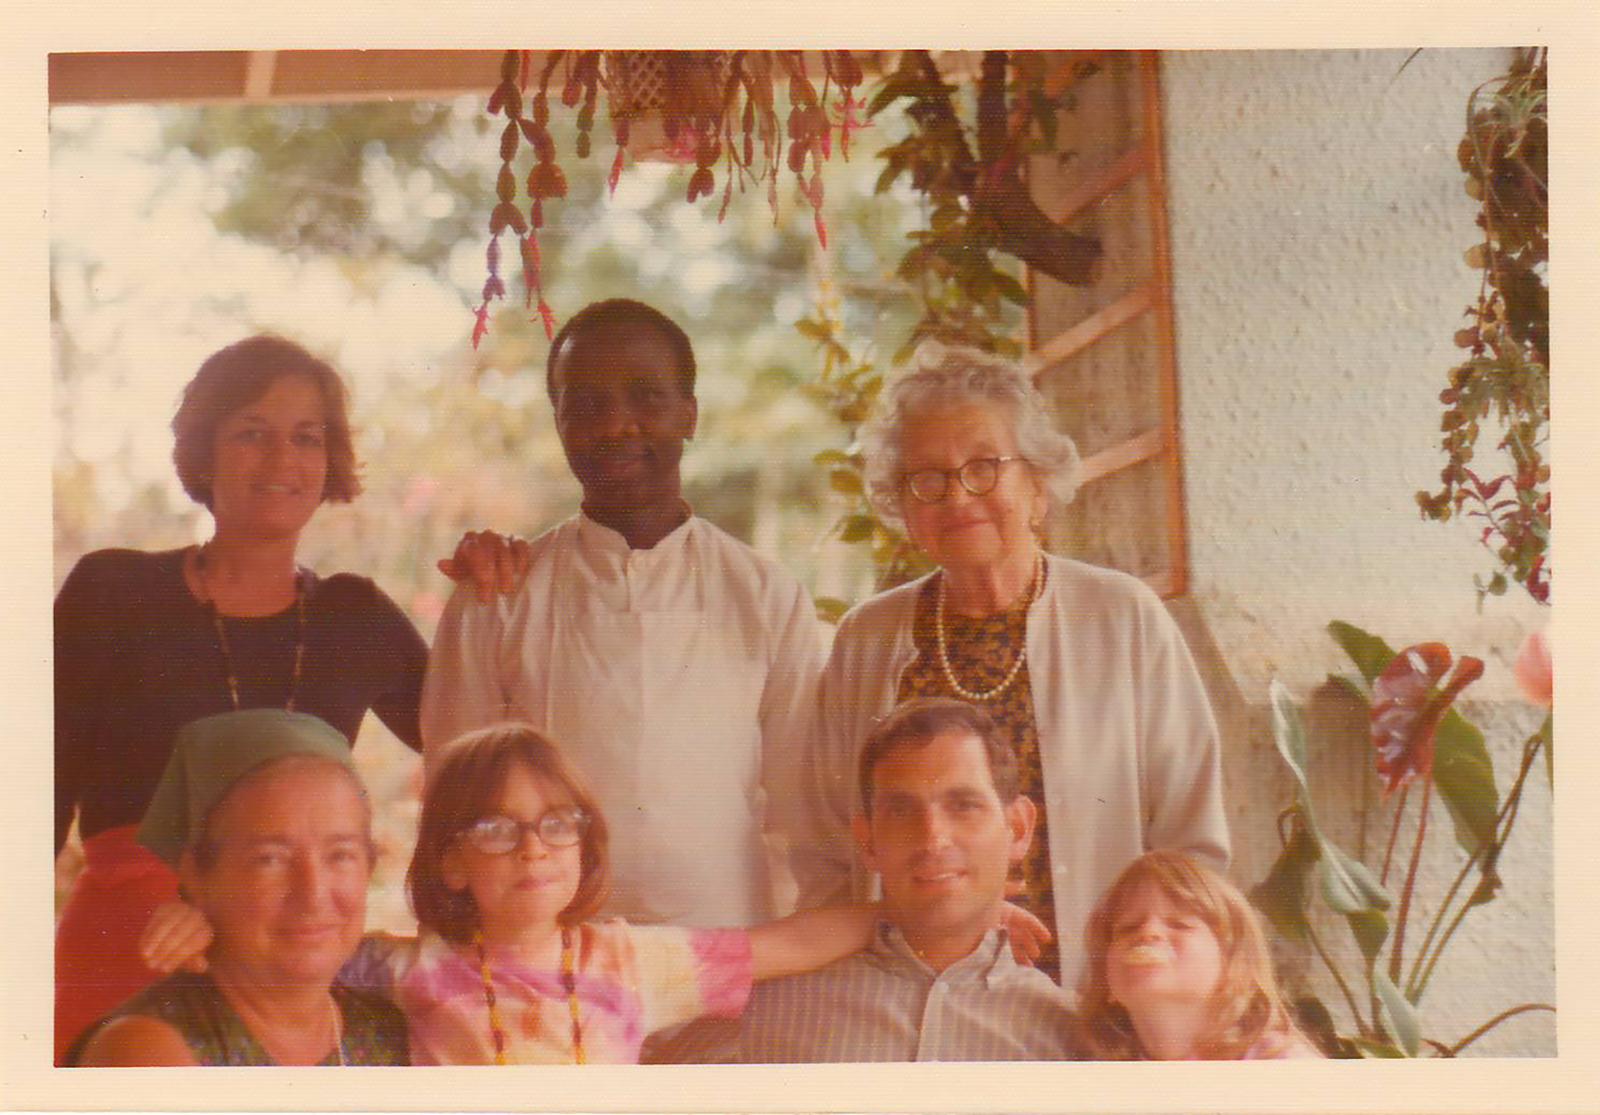 Tana Senn's family in Kenya. Top row, left to right: Eve Senn (mother), Lazaro, Selma Liebschutz (great-grandmother). Bottom row: Lisa Rozsa (grandmother), Mara Senn (sister), Dick Senn (father), Tana.